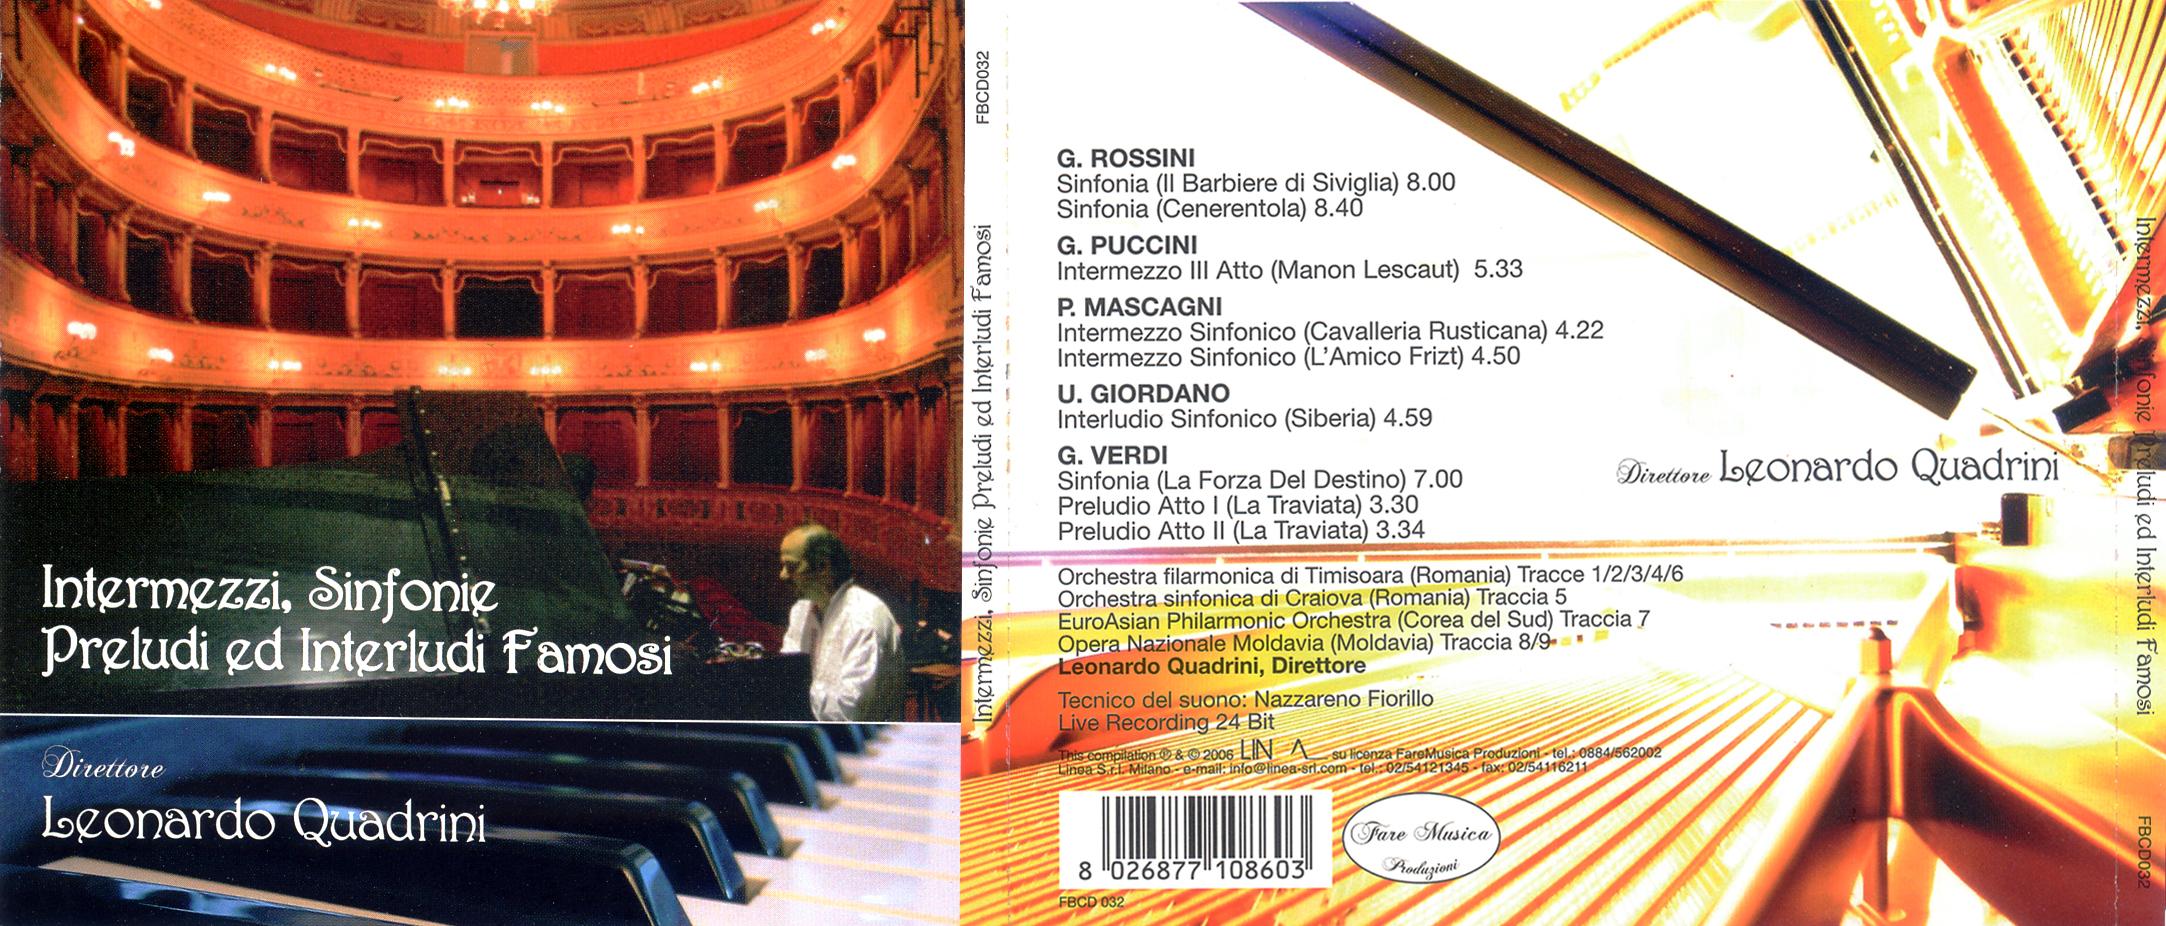 Intermezzi, Sinfonie Preludi ed Interludi Famosi